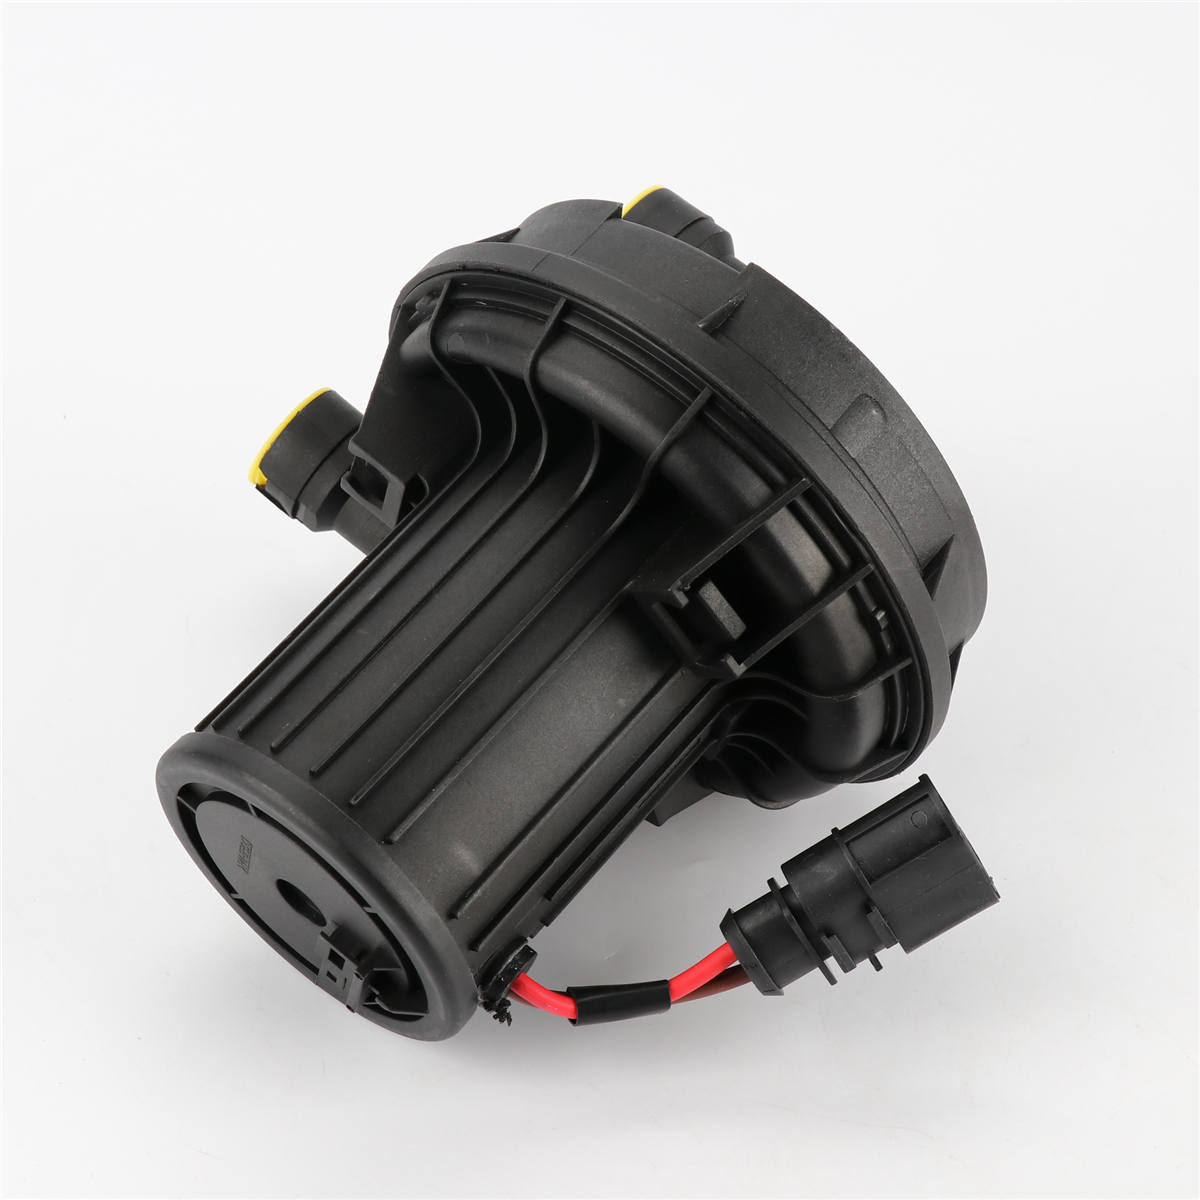 цены на 1pcs Secondary Auxiliary Smog Air Pump for VW Jetta Golf Passat B5 A4 A6 A8 06A 959 253 XH  в интернет-магазинах